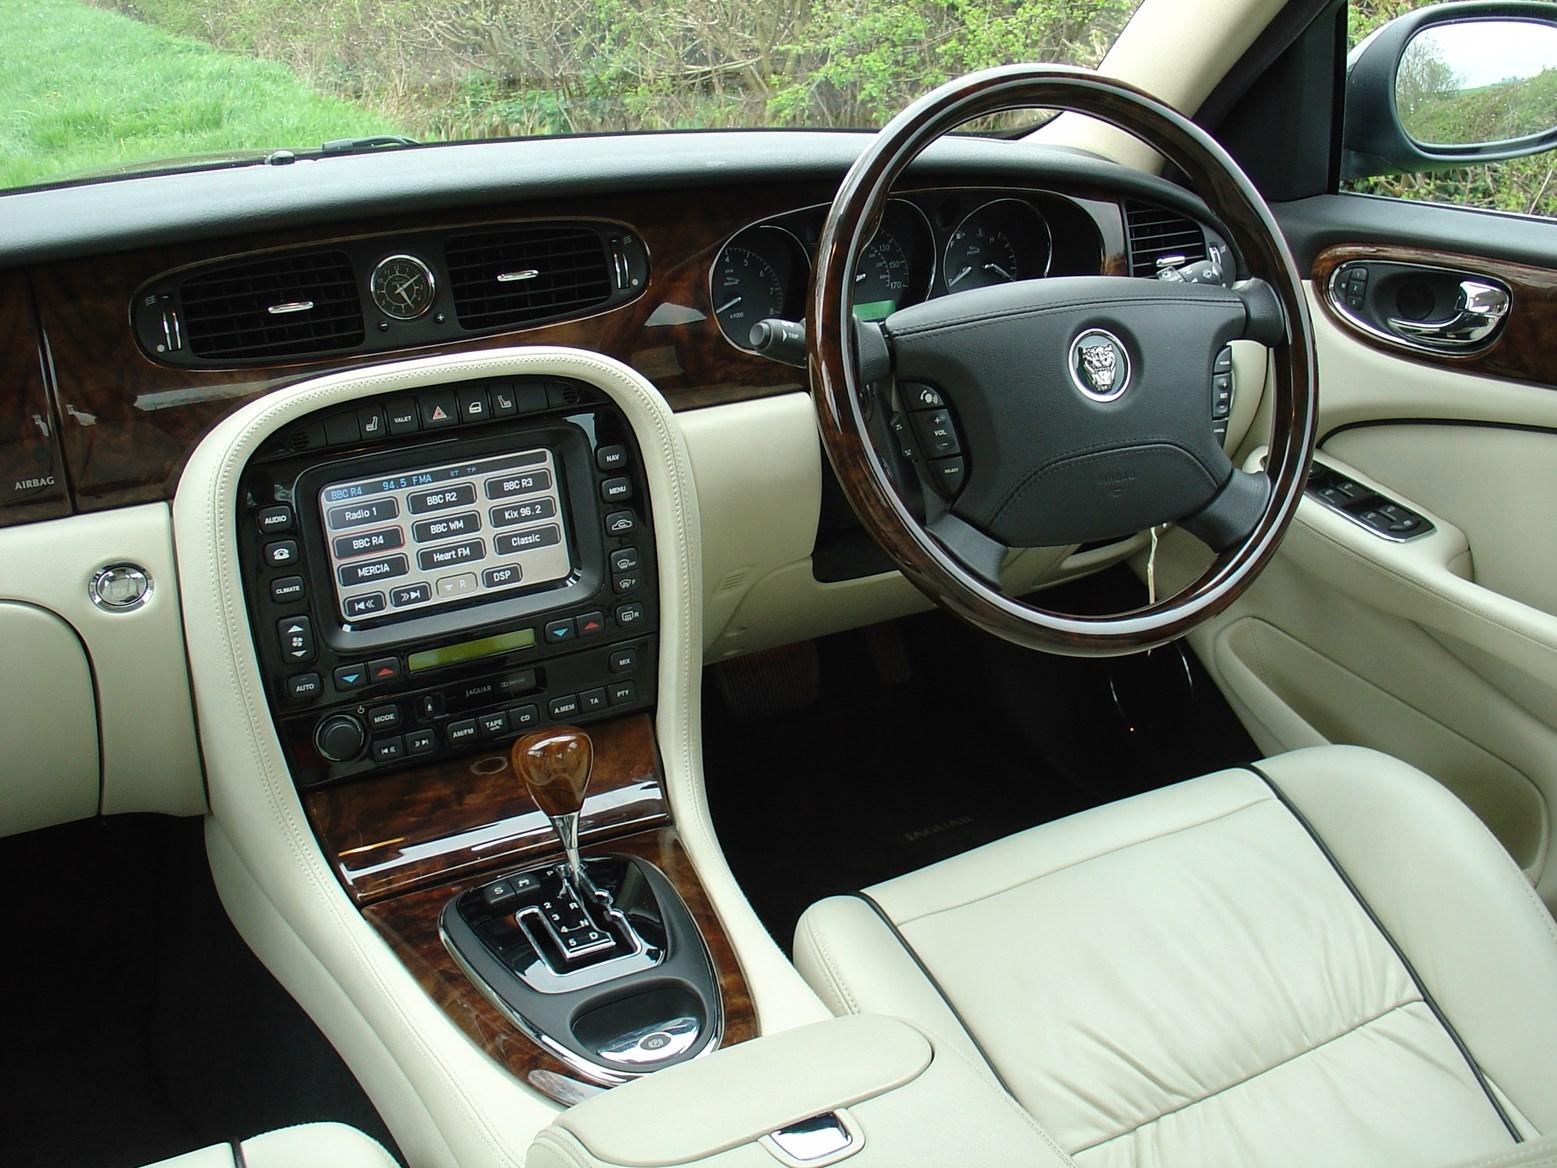 jaguar xj saloon review 2003 2009 parkers. Black Bedroom Furniture Sets. Home Design Ideas